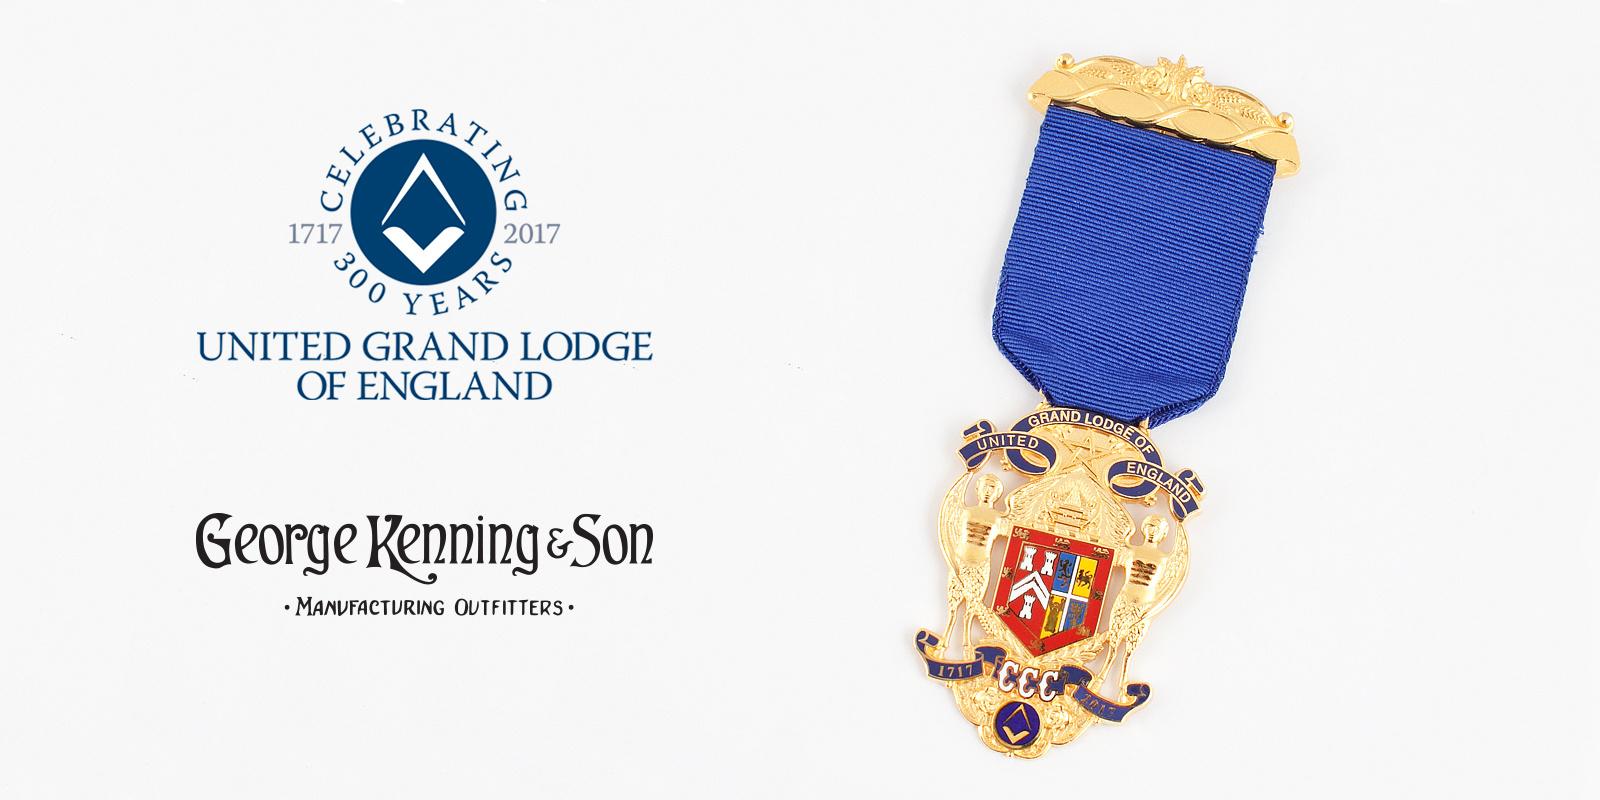 George Kenning & Son | British Handmade Masonic Regalia